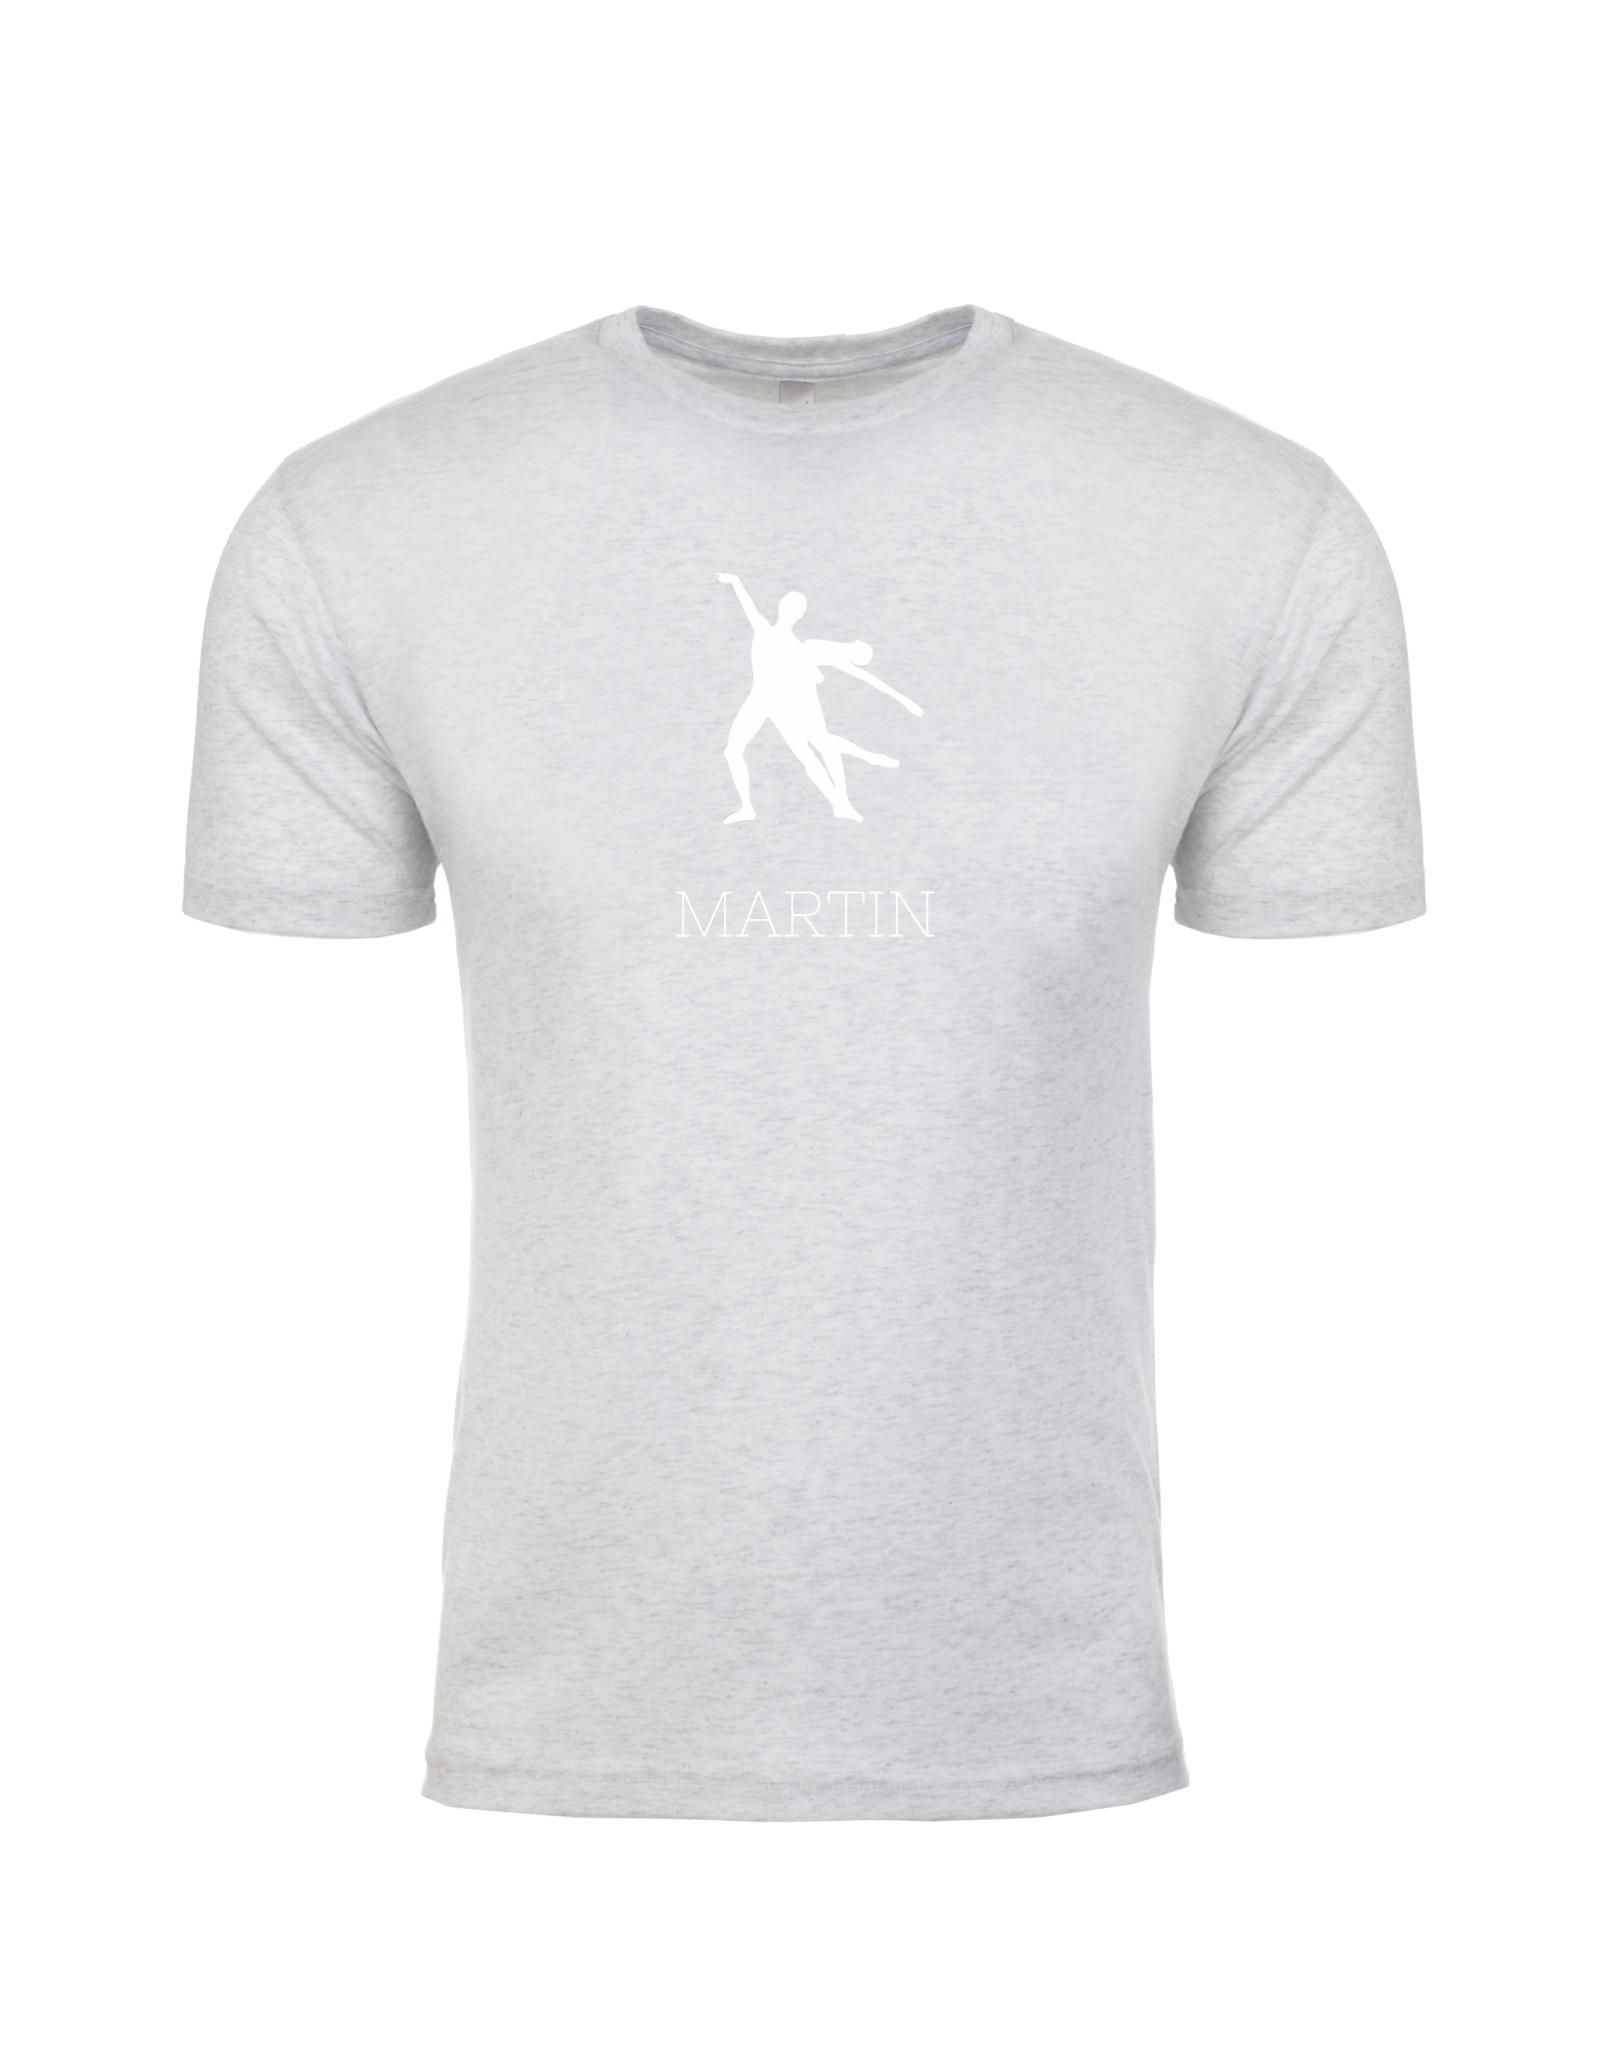 Next Level Apparel Martin T-shirt